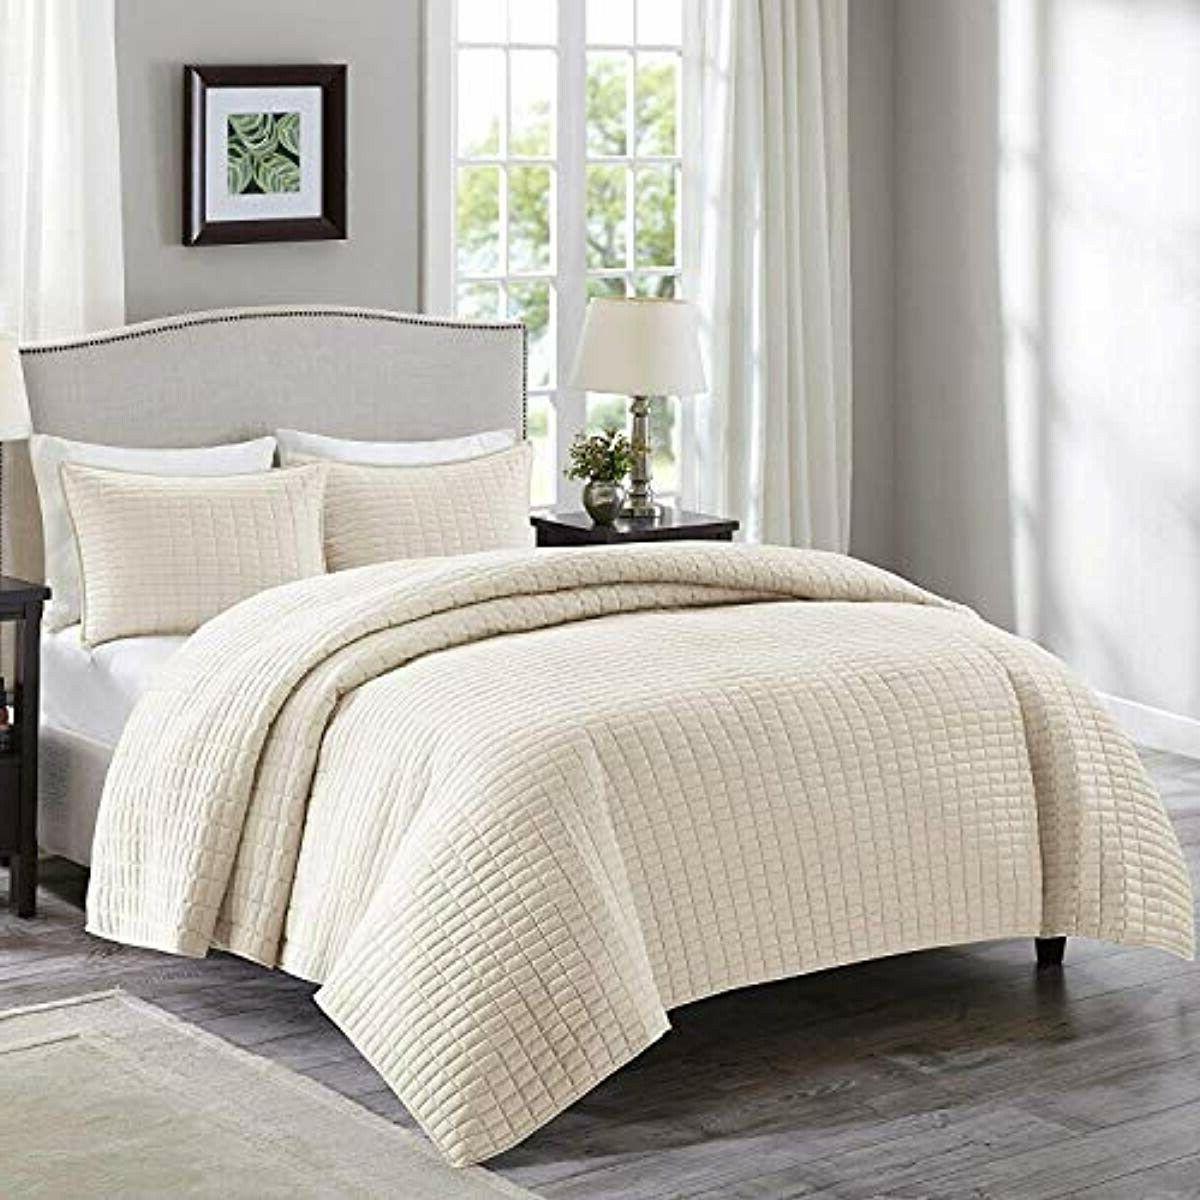 kienna quilt mini set 3 piece ivory